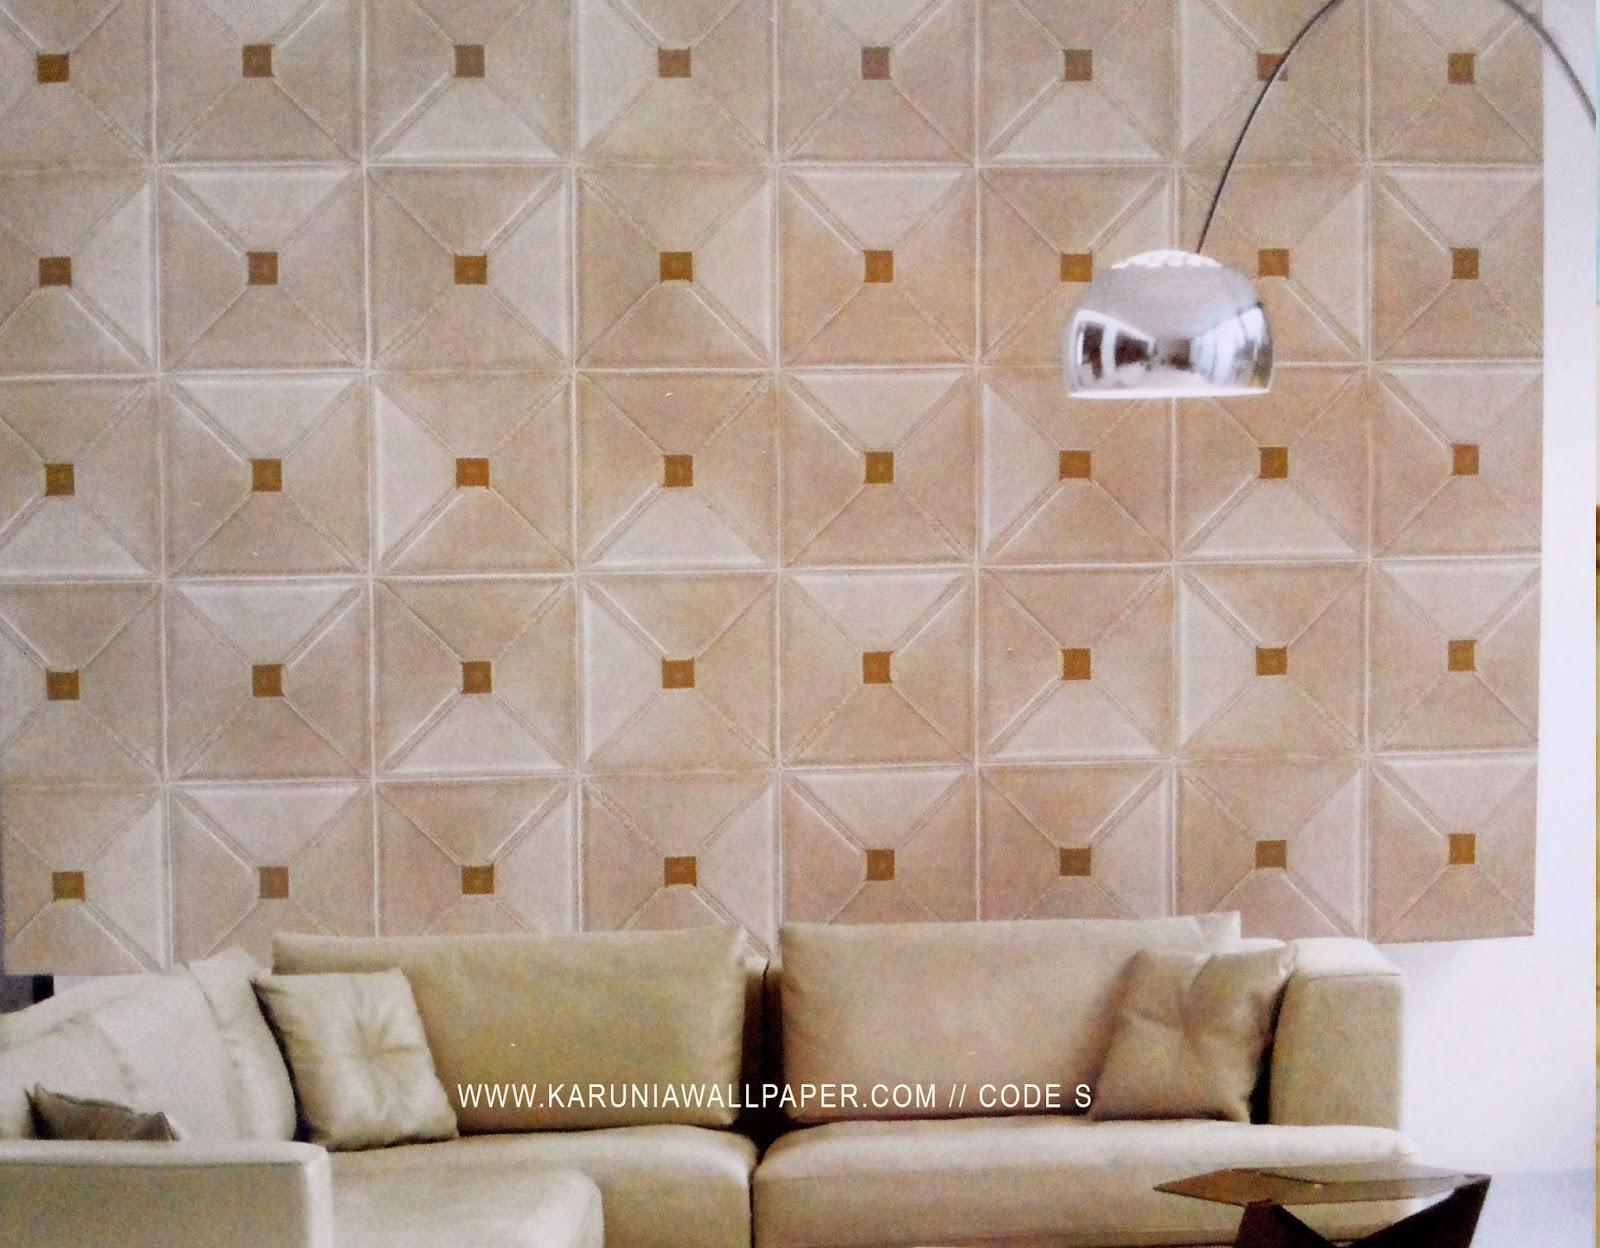 wallapepr dinding 3 dimensi karuniawallpaper surabaya